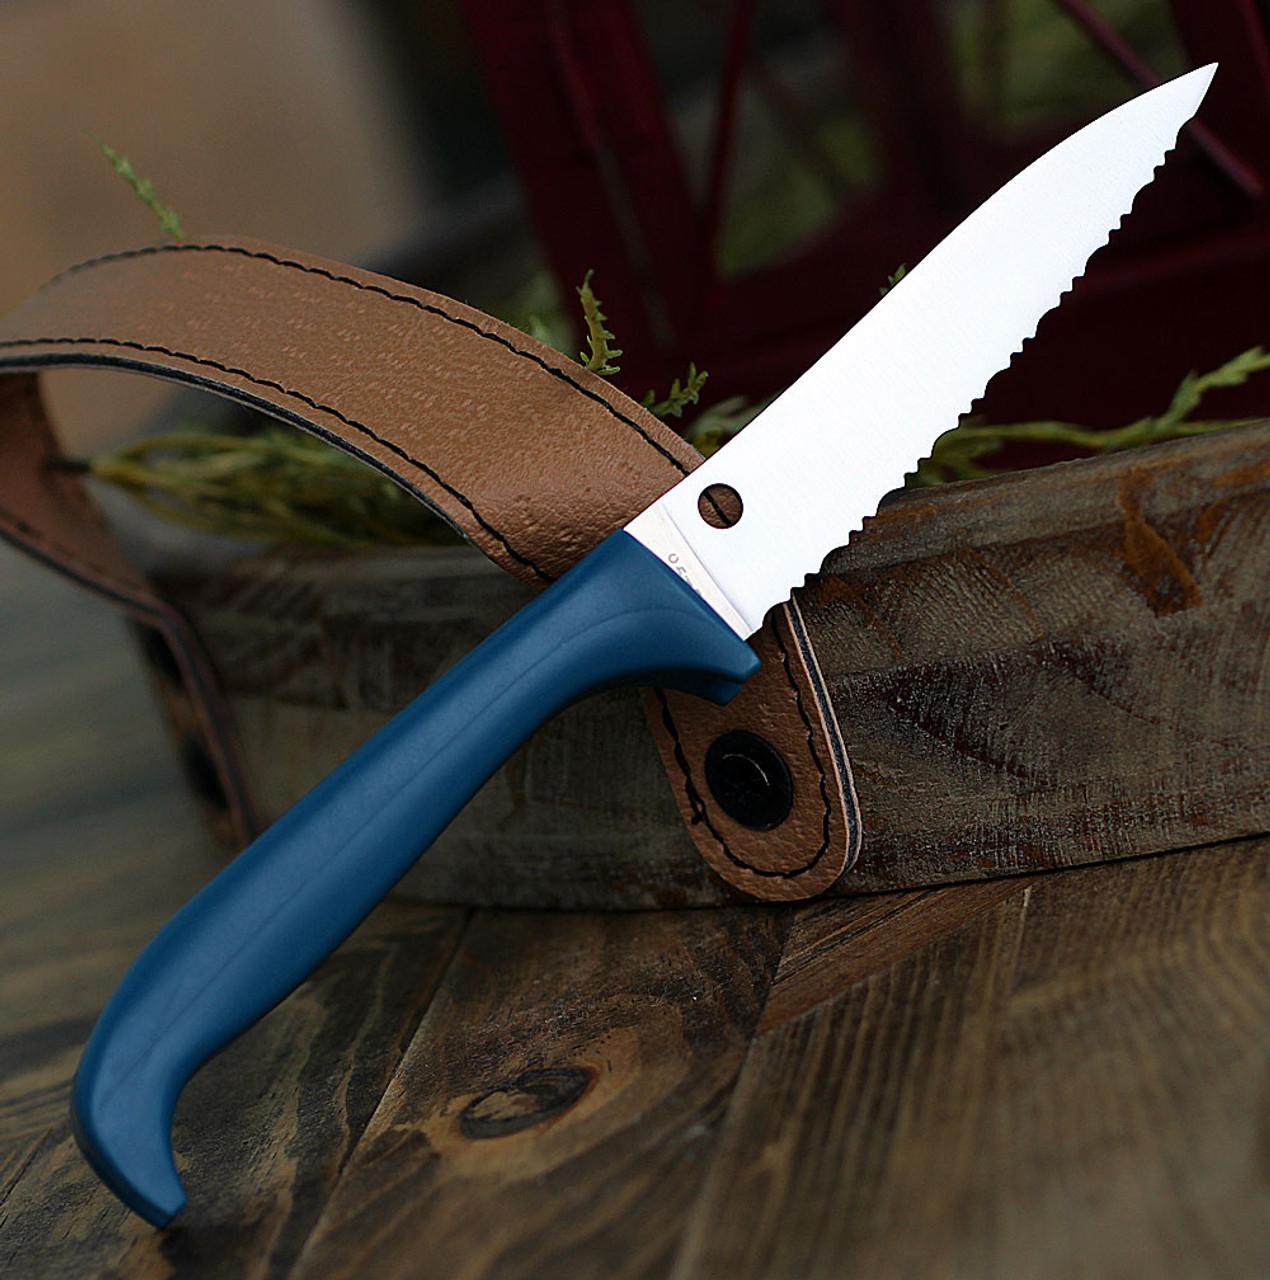 "Spyderco Counter Puppy K20SBL, 3.46"" 7Cr17 Serrated Blade, Blue Handle"